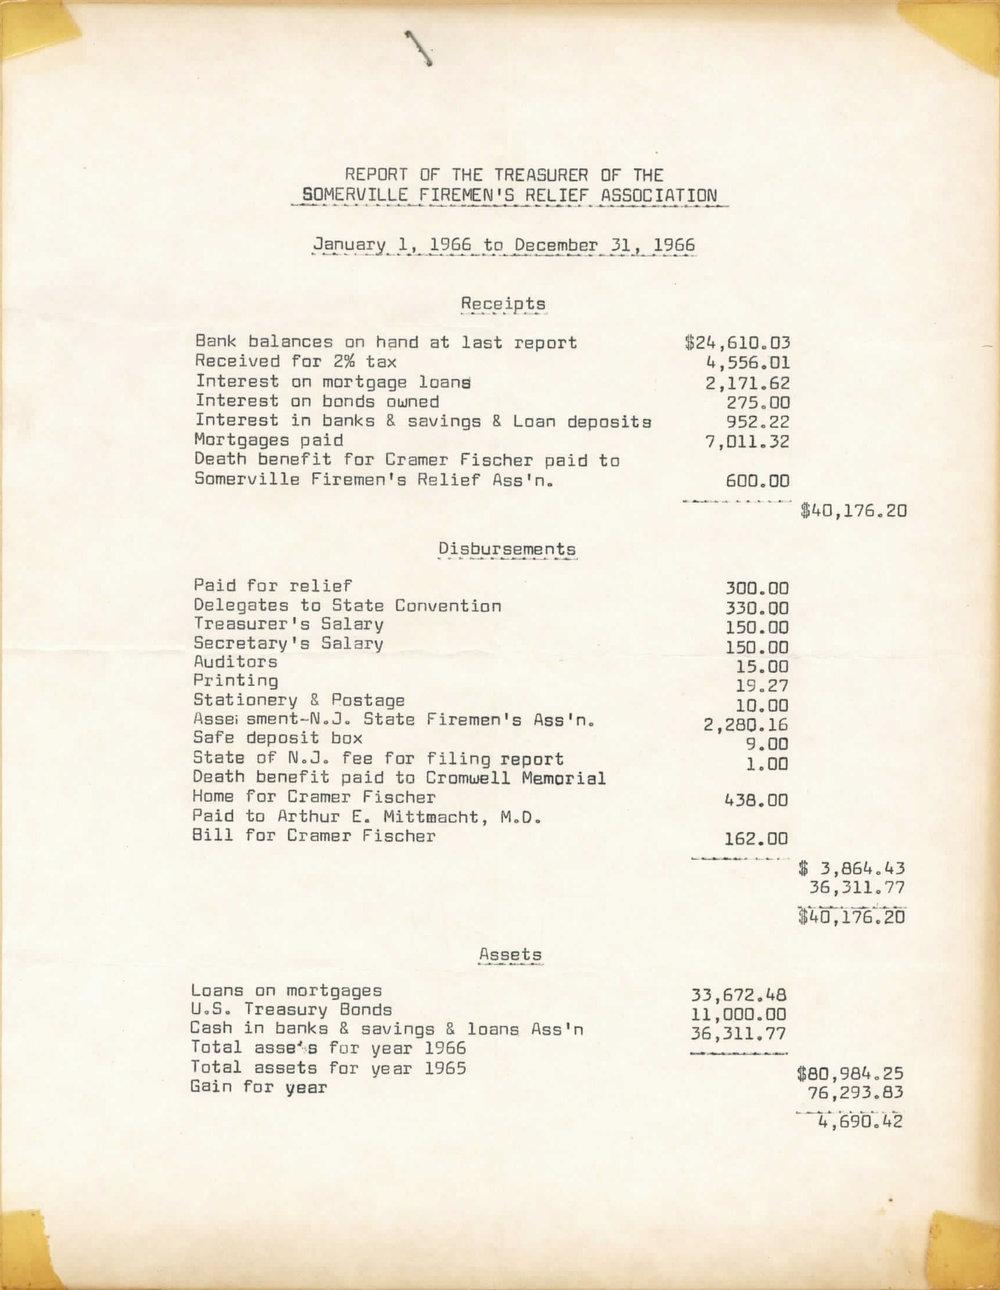 1966 Treasurer memo_Page_1_Image_0001.jpg